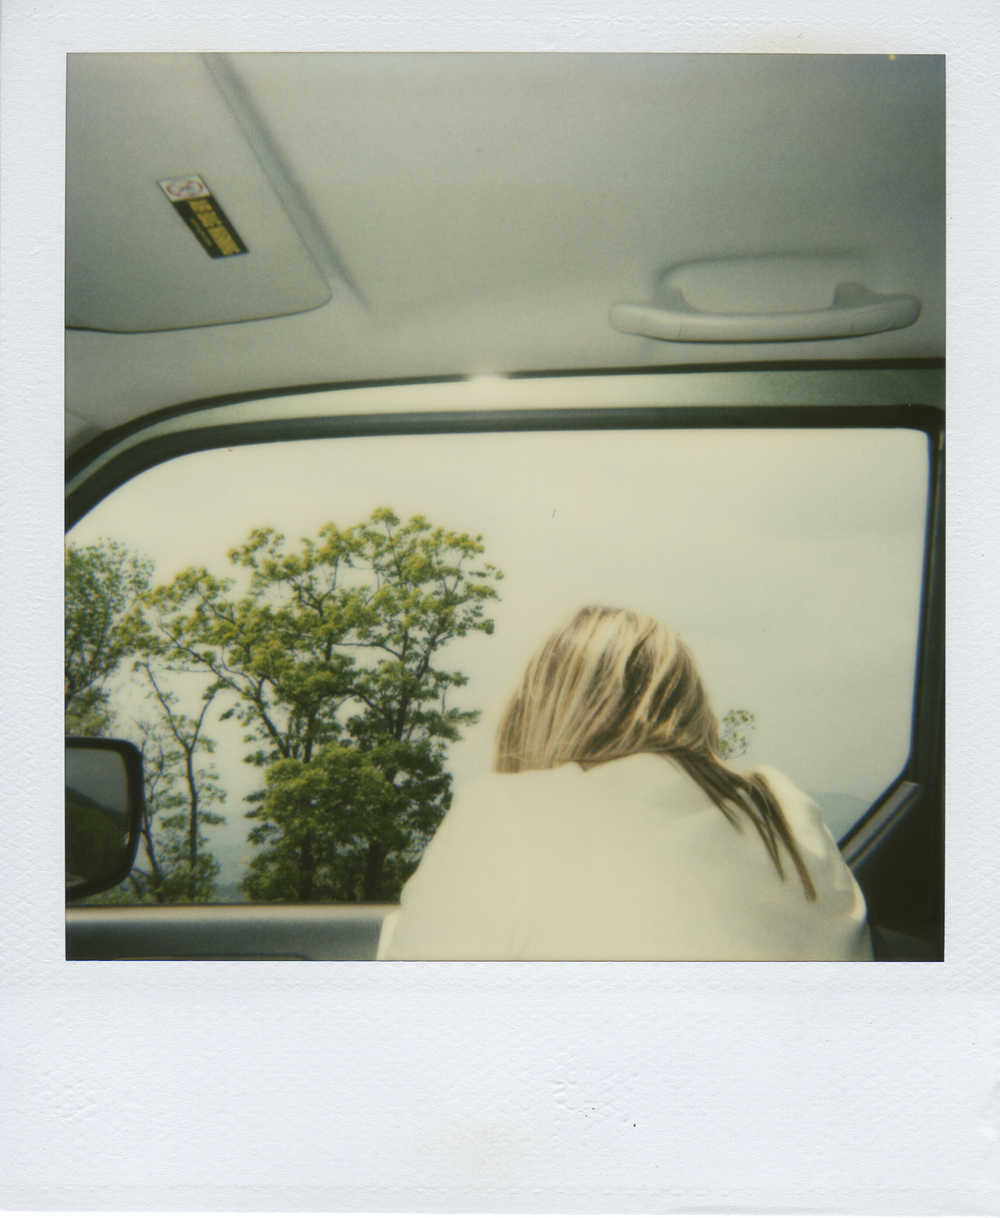 jlaurence-polaroid-075.jpg